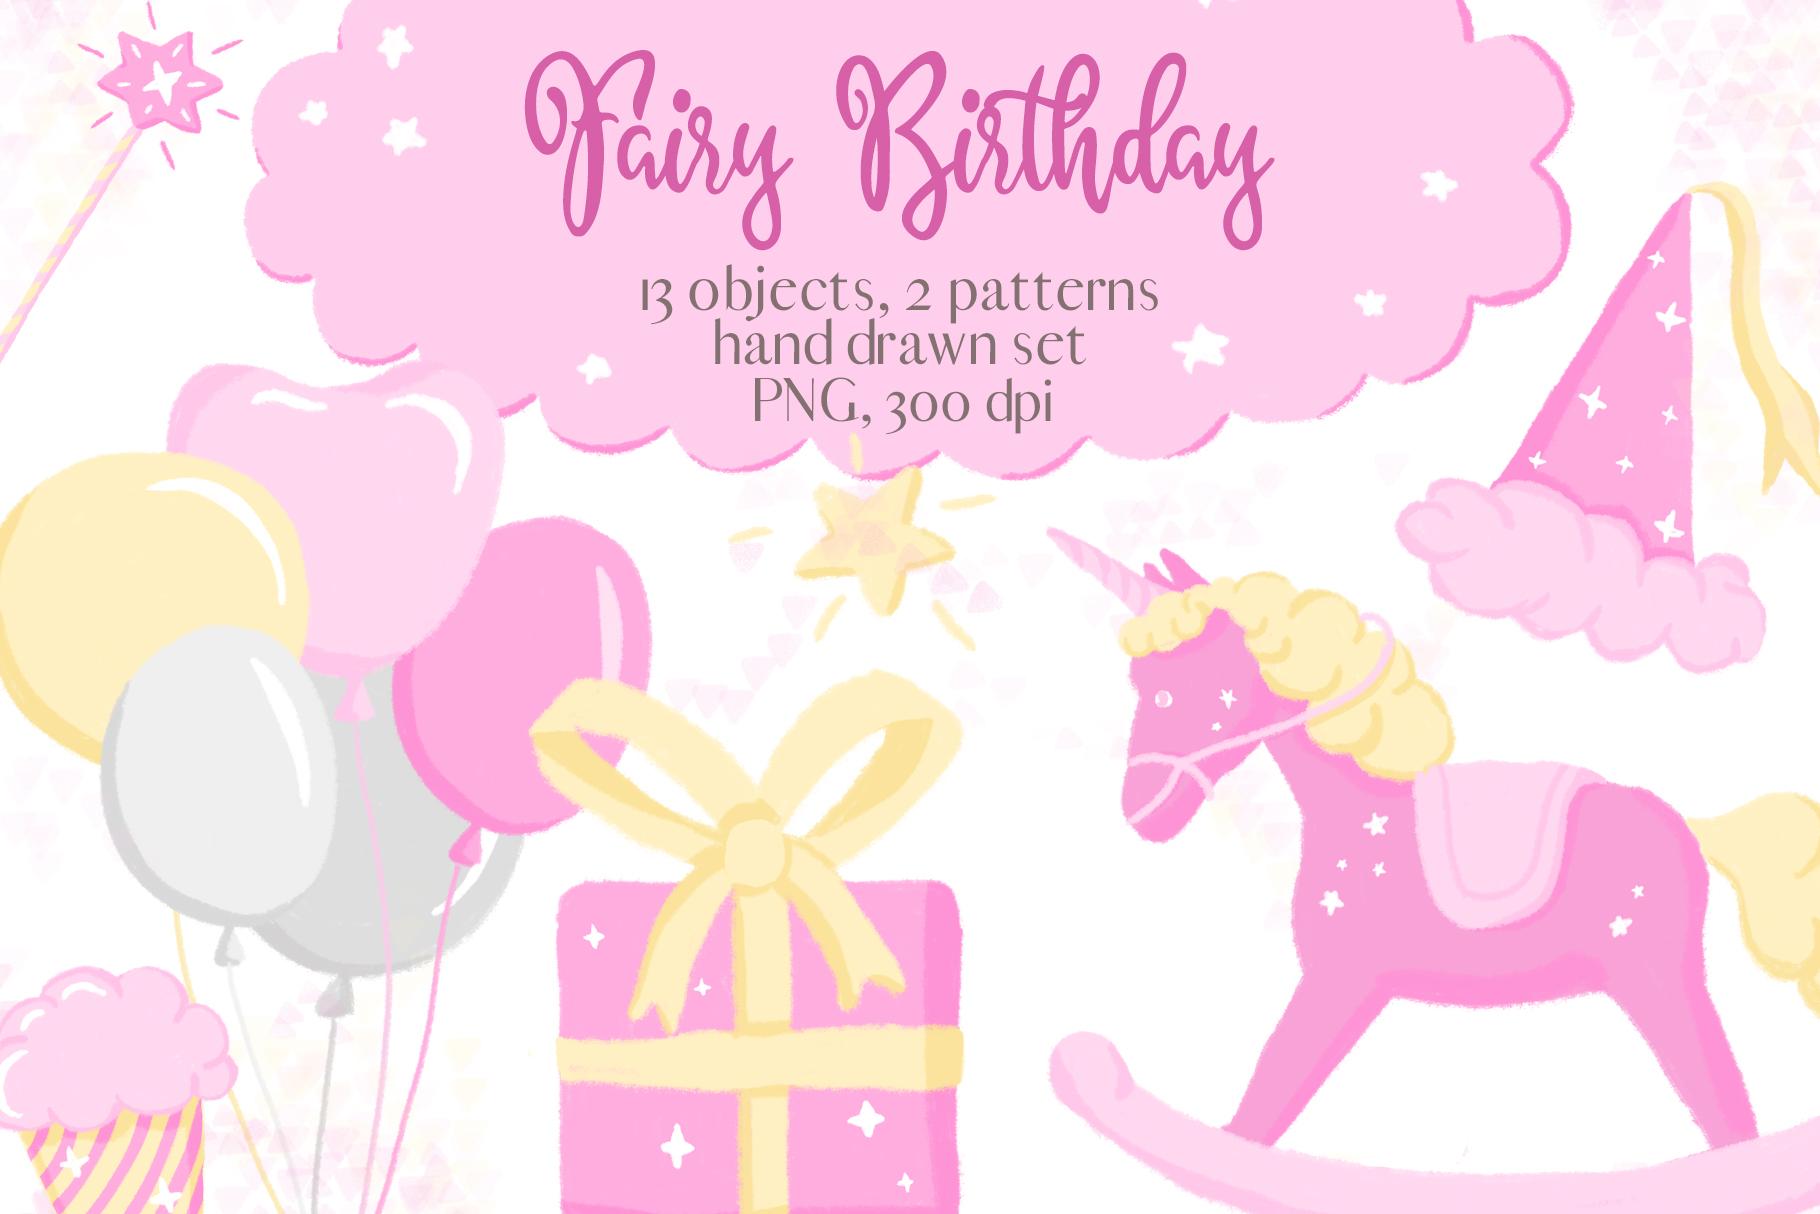 Fairy birthday pink.